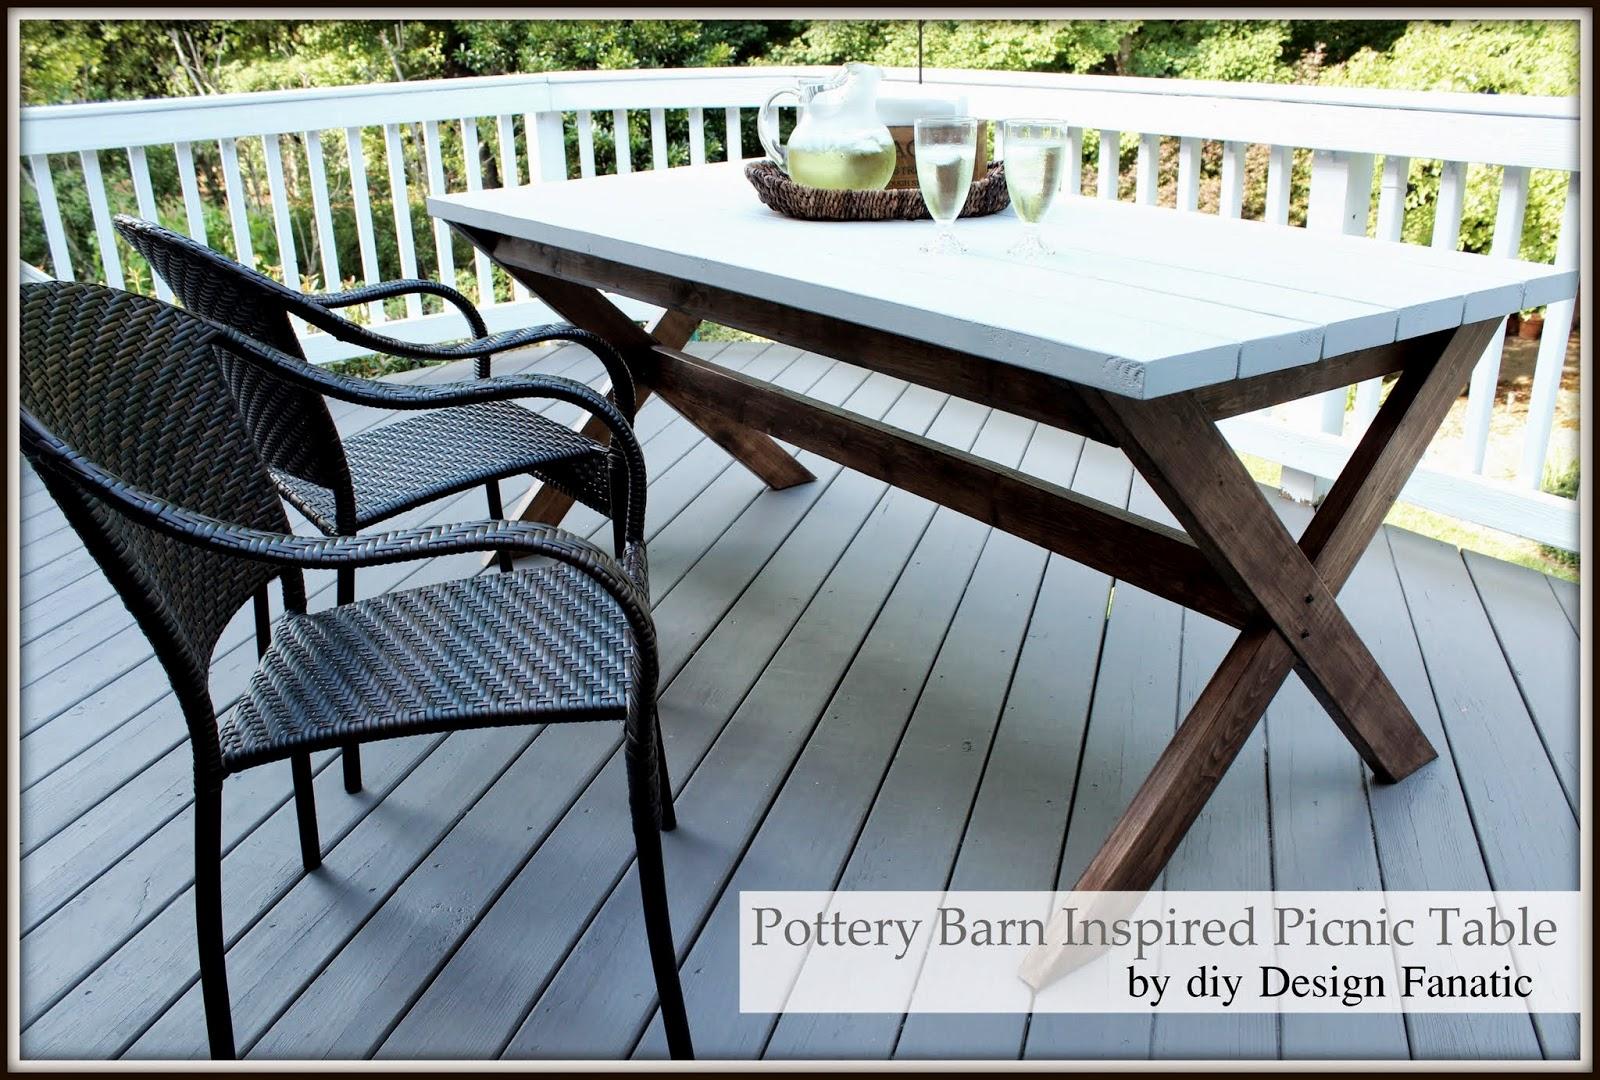 Simple picnic table Kreg jig Behr deck stain